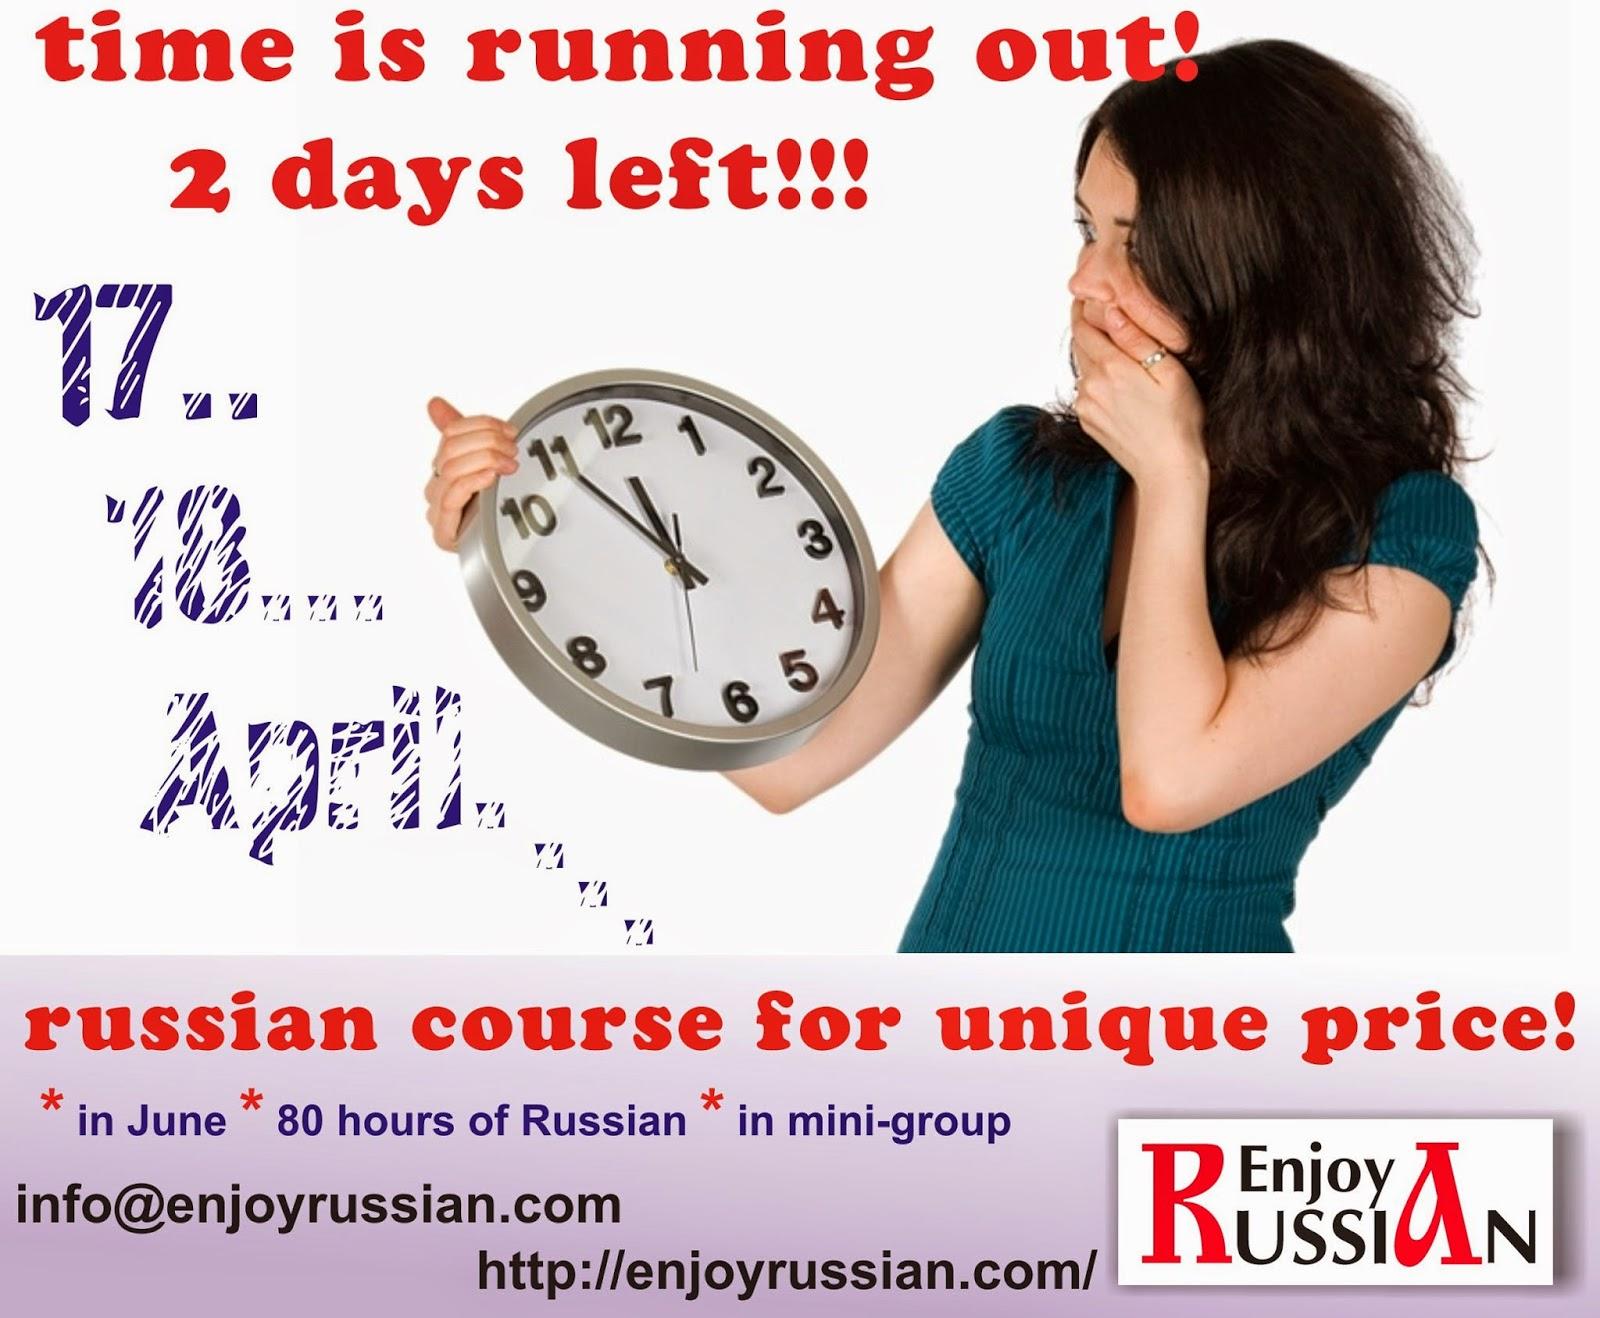 http://enjoyrussian.com/3686_programs/3687_summer_russian_courses/